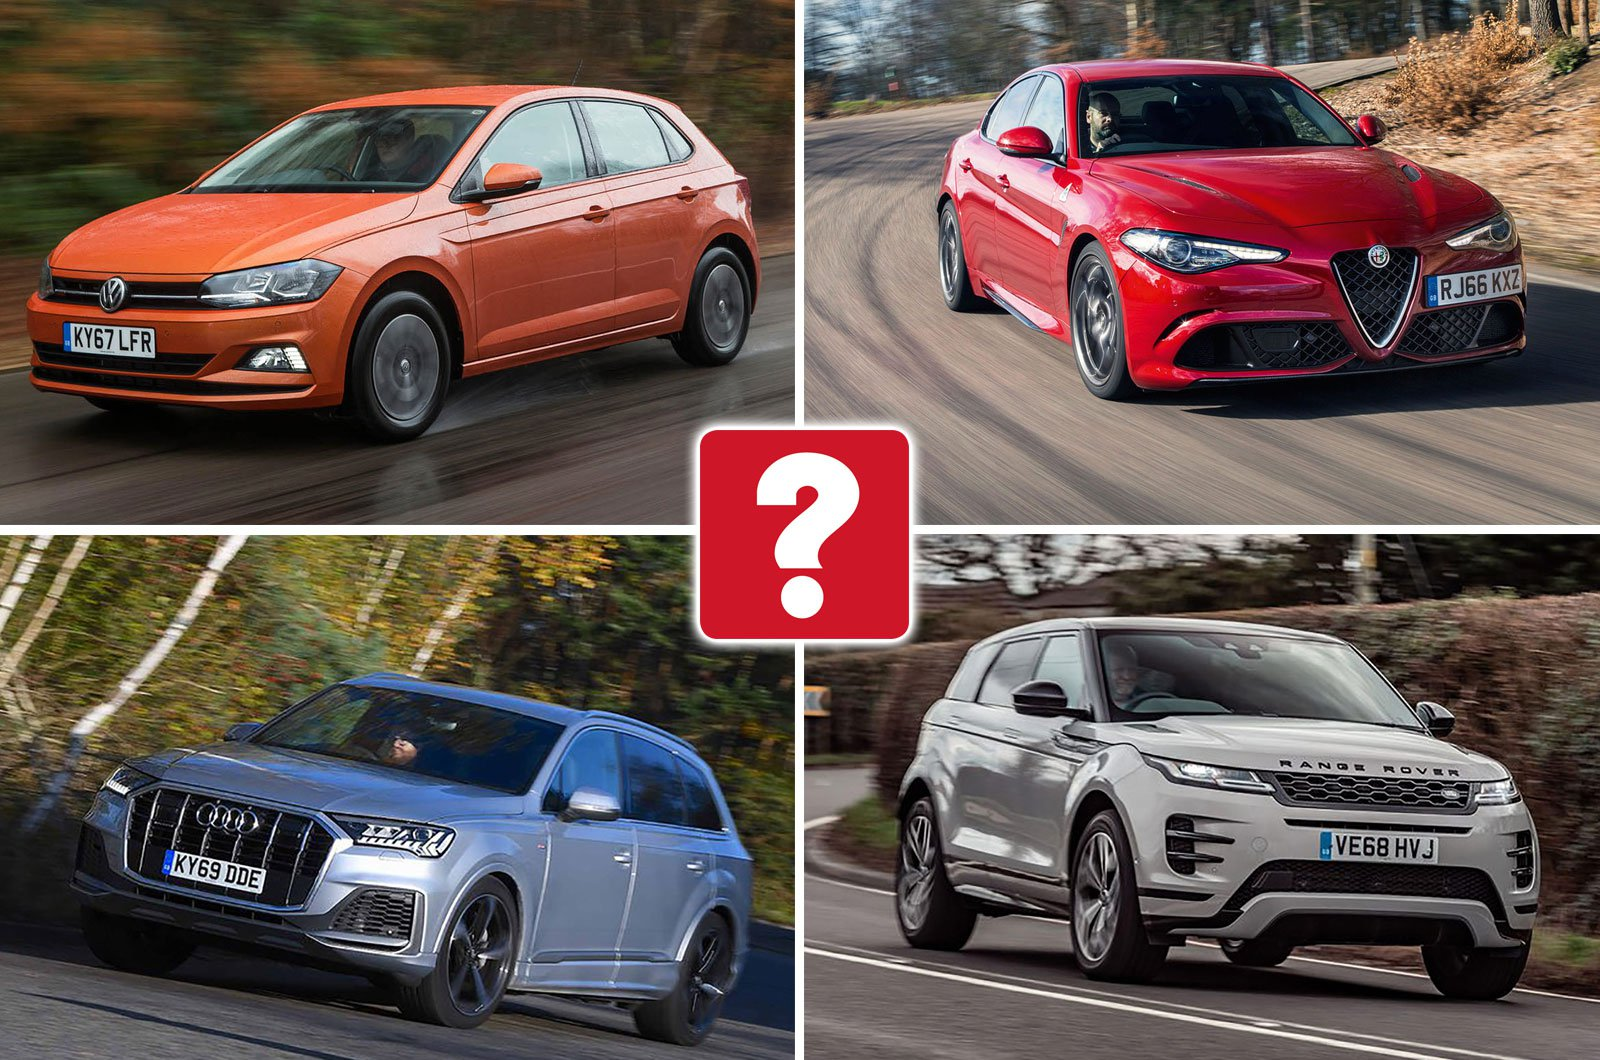 Volkswagen Polo, Alfa Romeo Giulia Quadrifoglio, Audi Q7, Range Rover Evoque